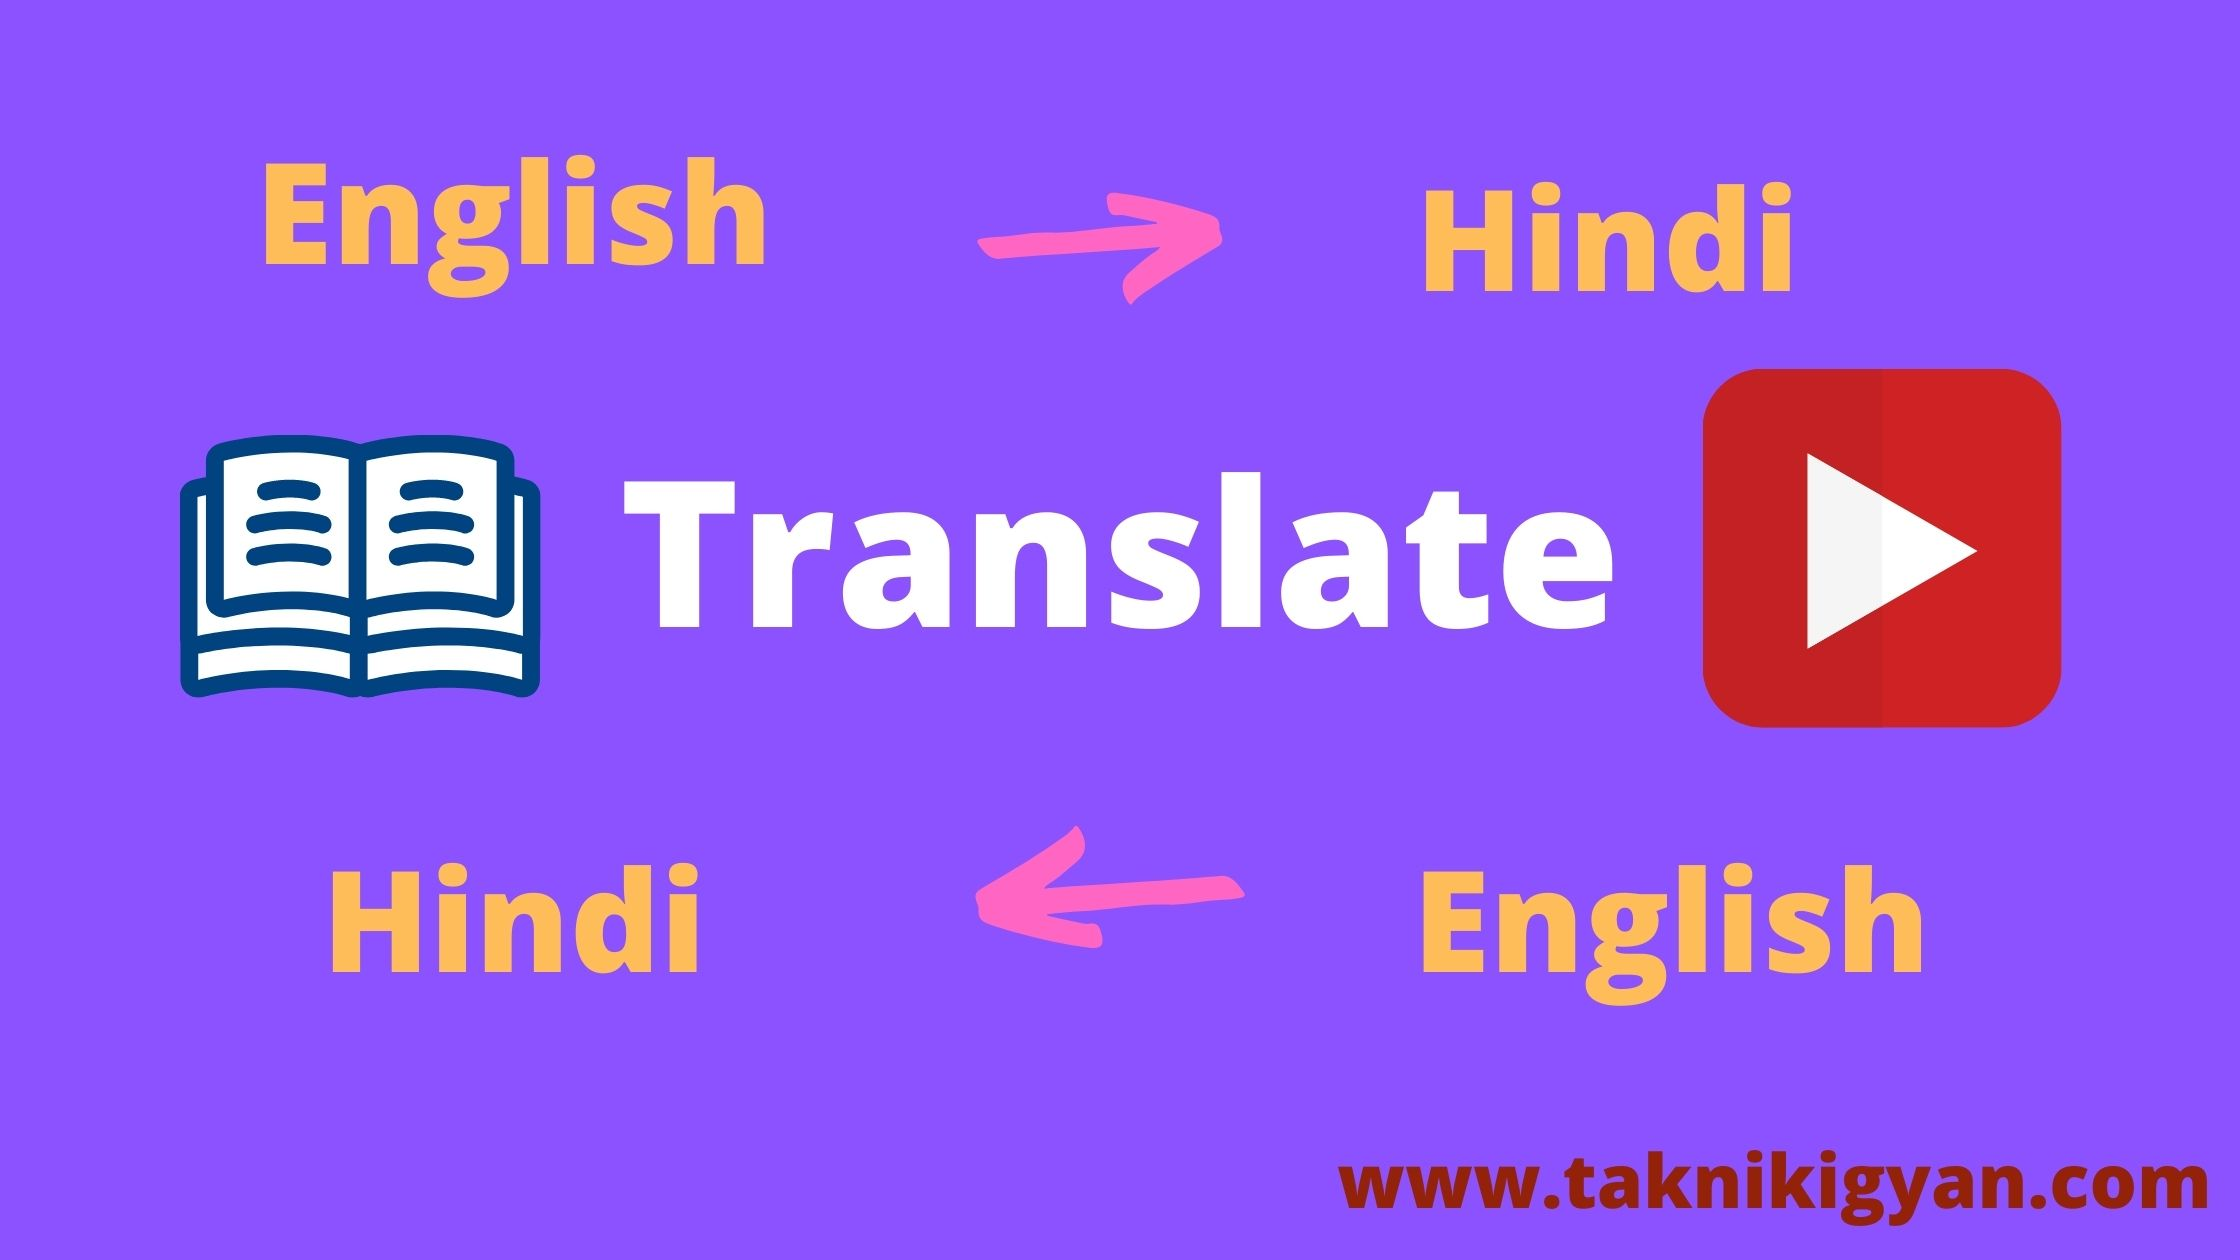 English To Hindi translate